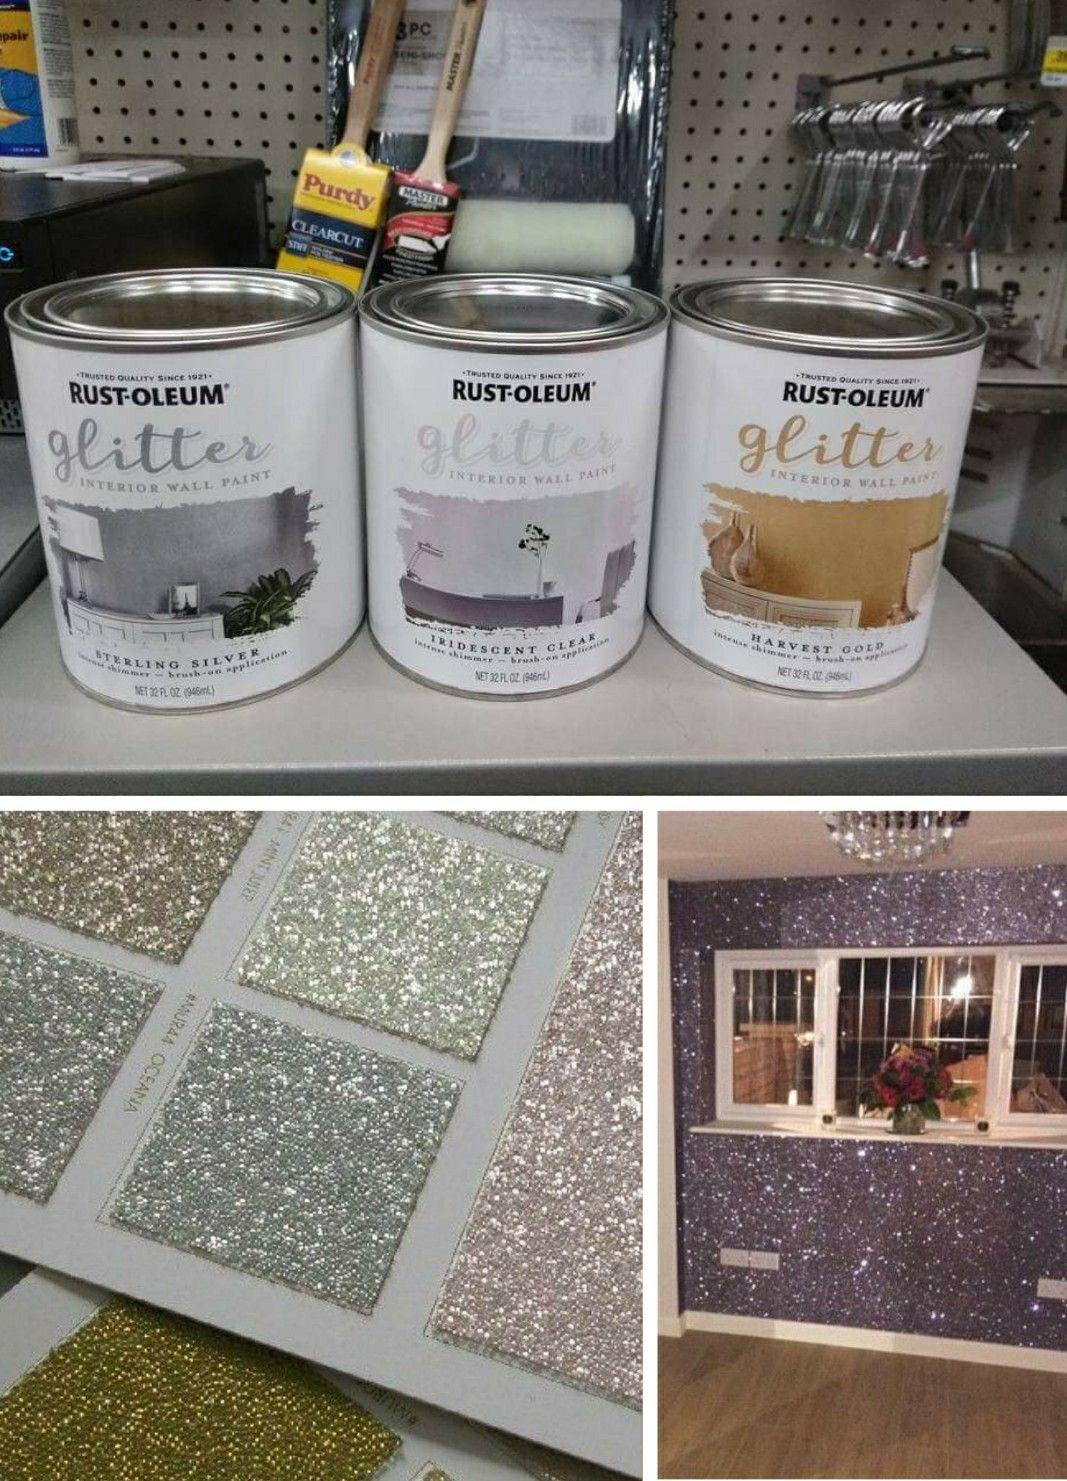 Rust Oleum Glitter Paint Paint Glitter Paint For Walls